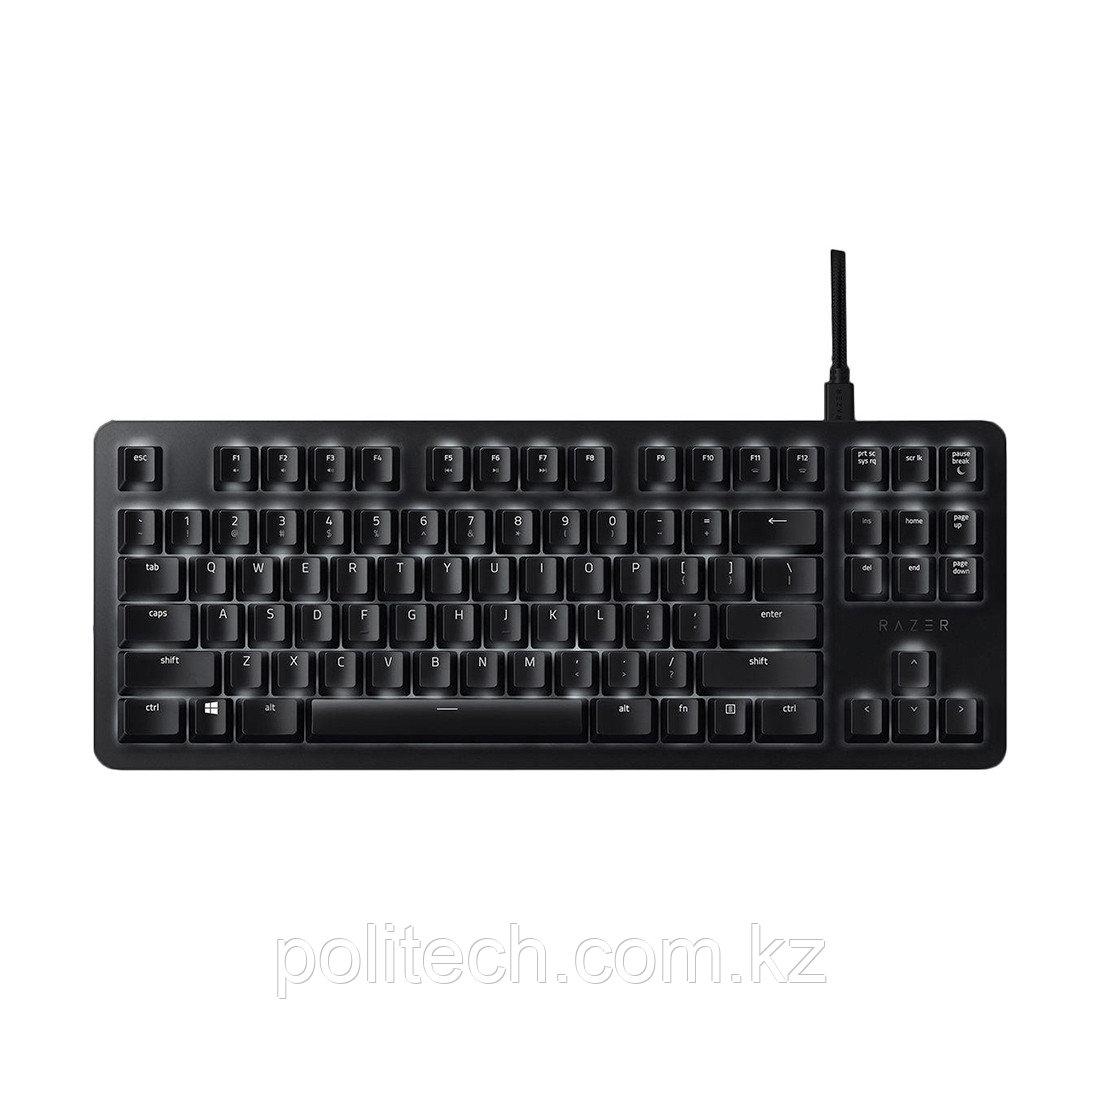 Клавиатура Razer Blackwidow Lite (Orange Switch)